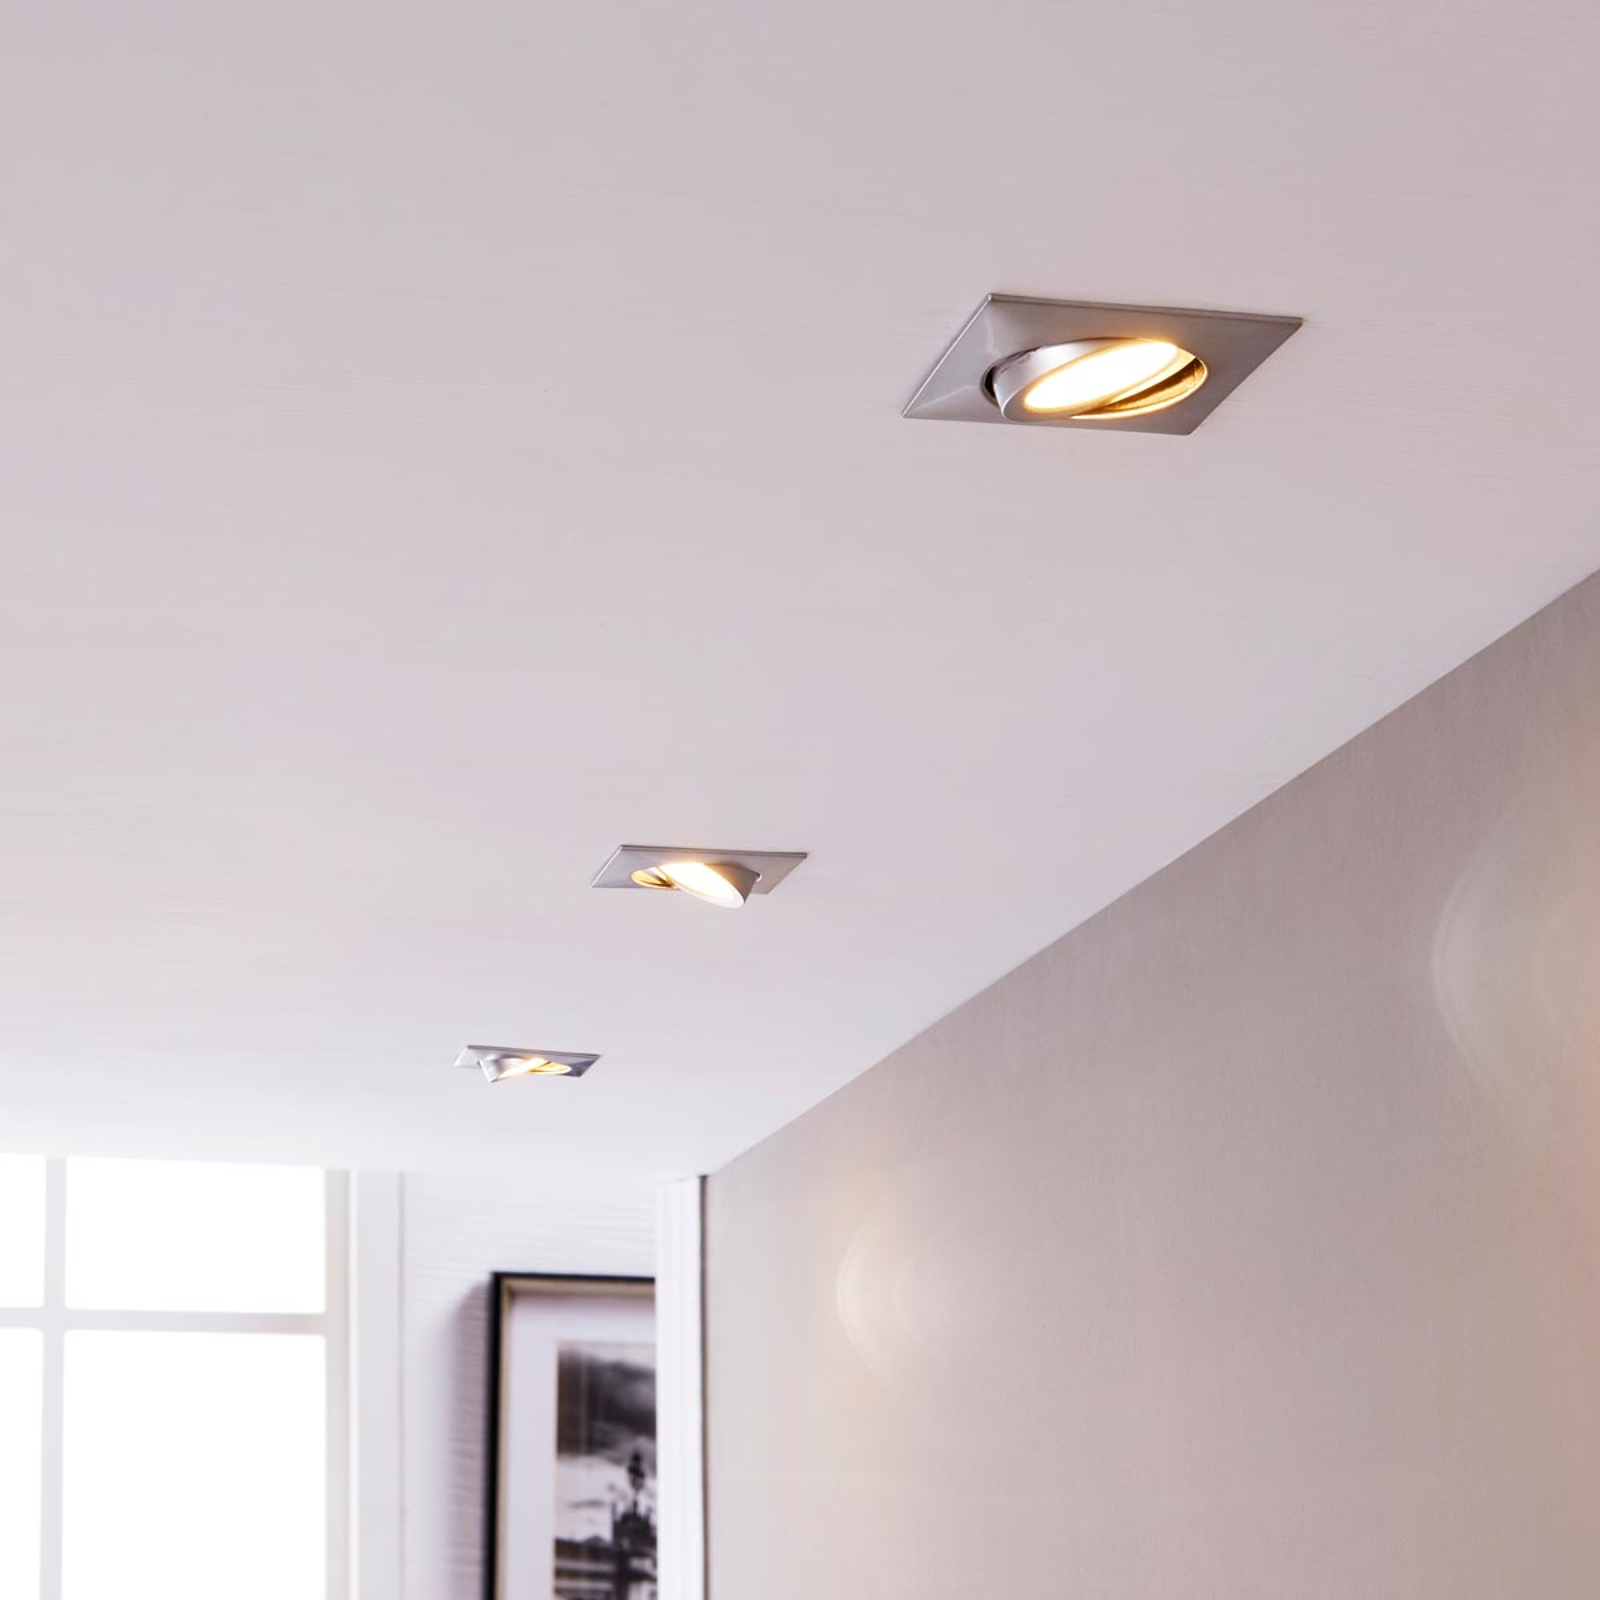 Chrom-Einbaulampen mit LEDs, eckig 3er-Set